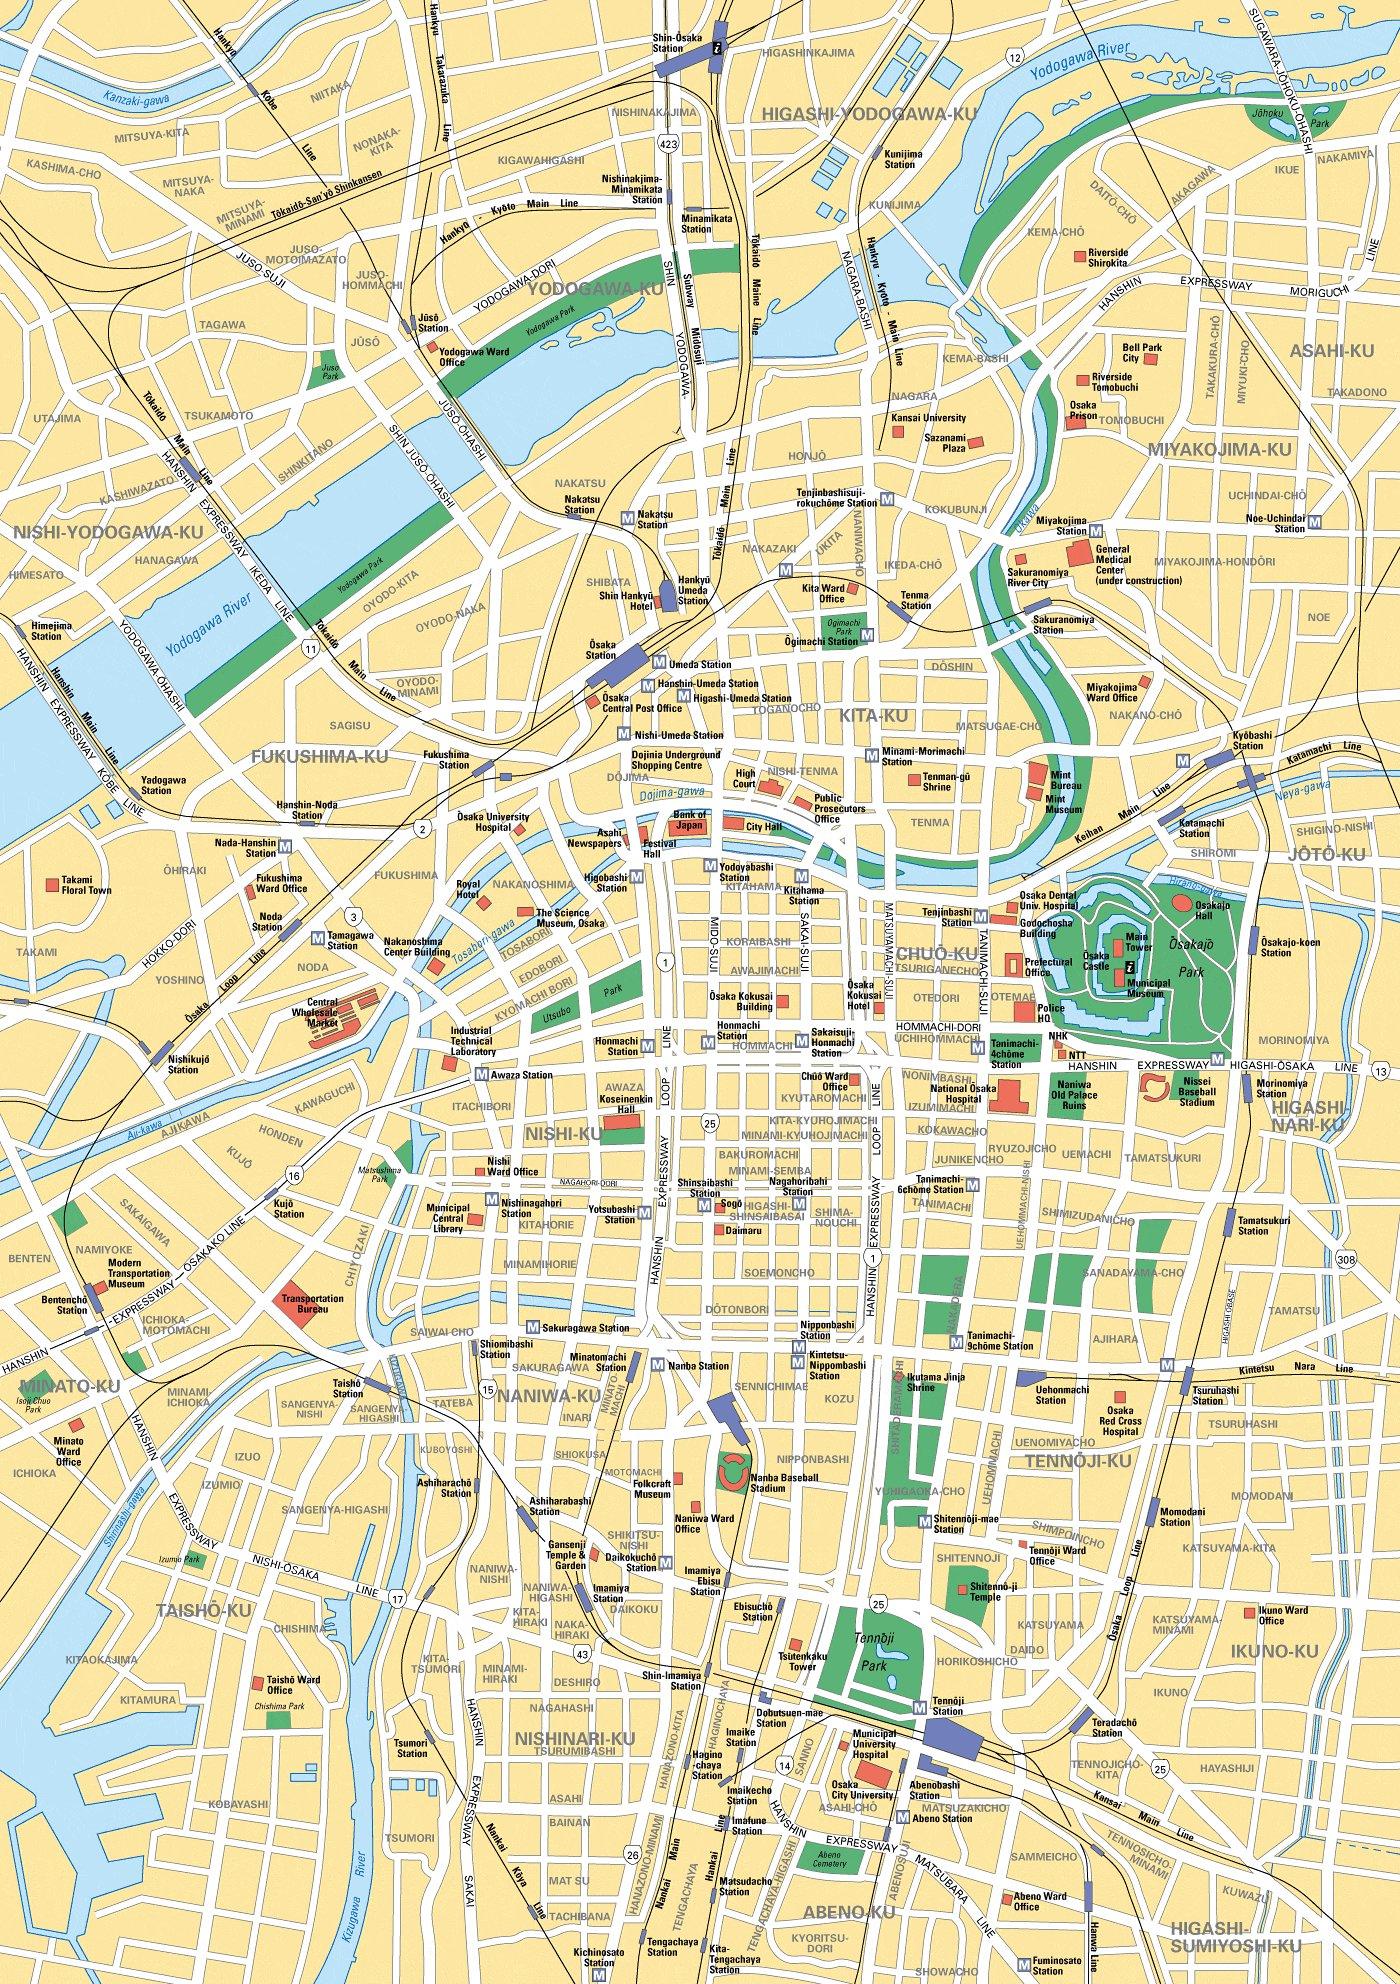 allwantsimg.com / карта города кирова подробная: http://allwantsimg.com/karta-goroda-kirova-podrobnaya